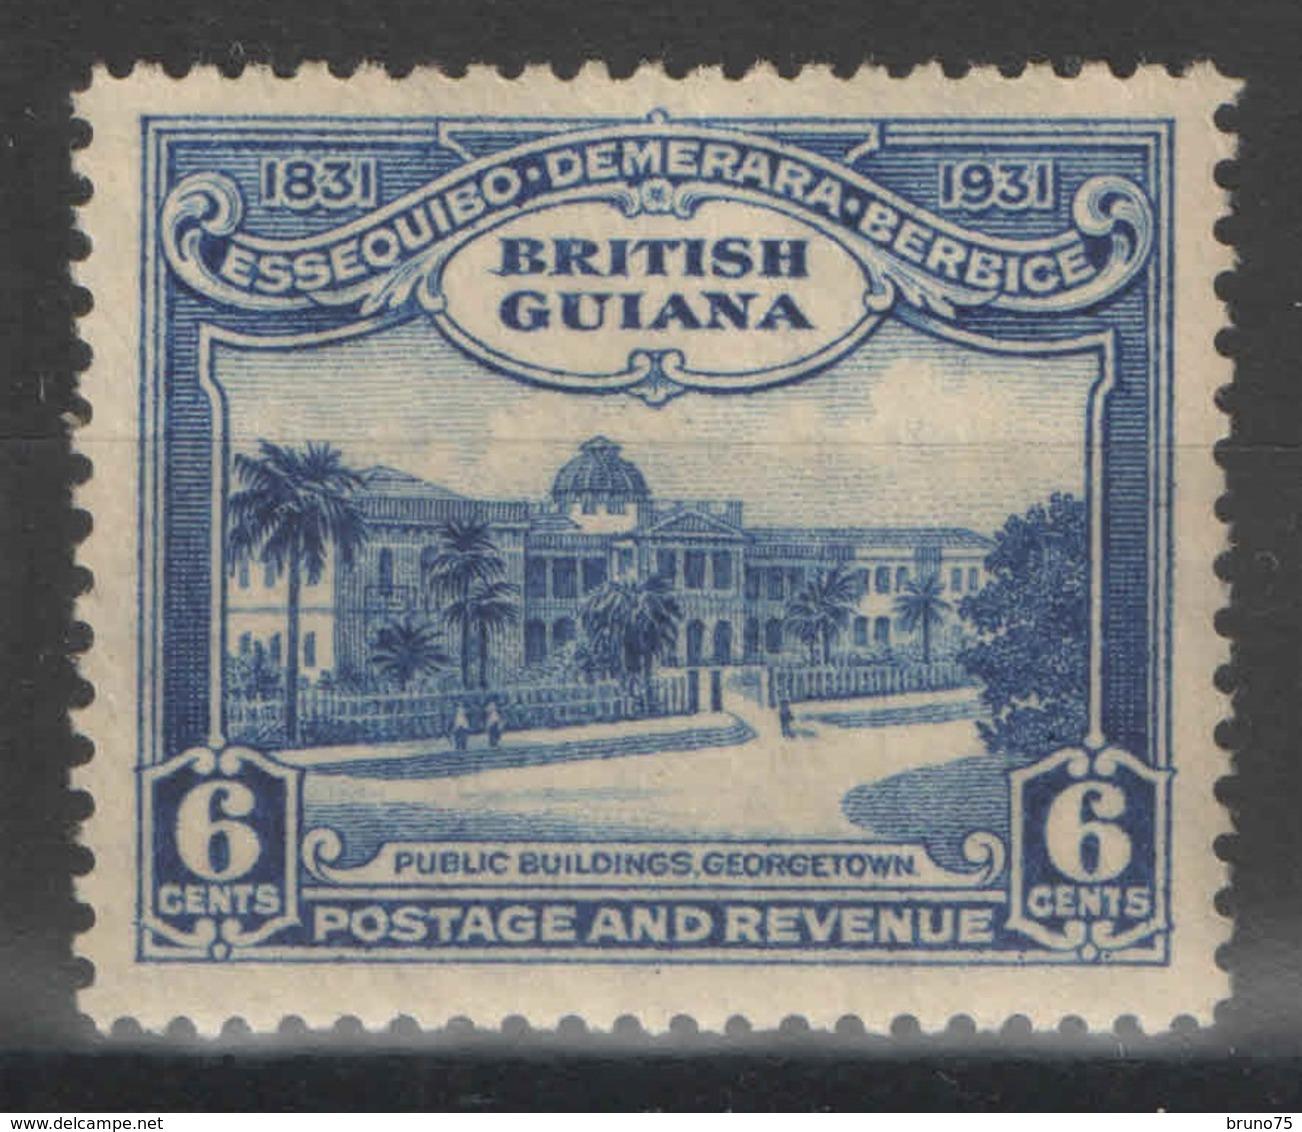 Guyane Britannique - British Guiana - YT 140 * - 1931 - British Guiana (...-1966)